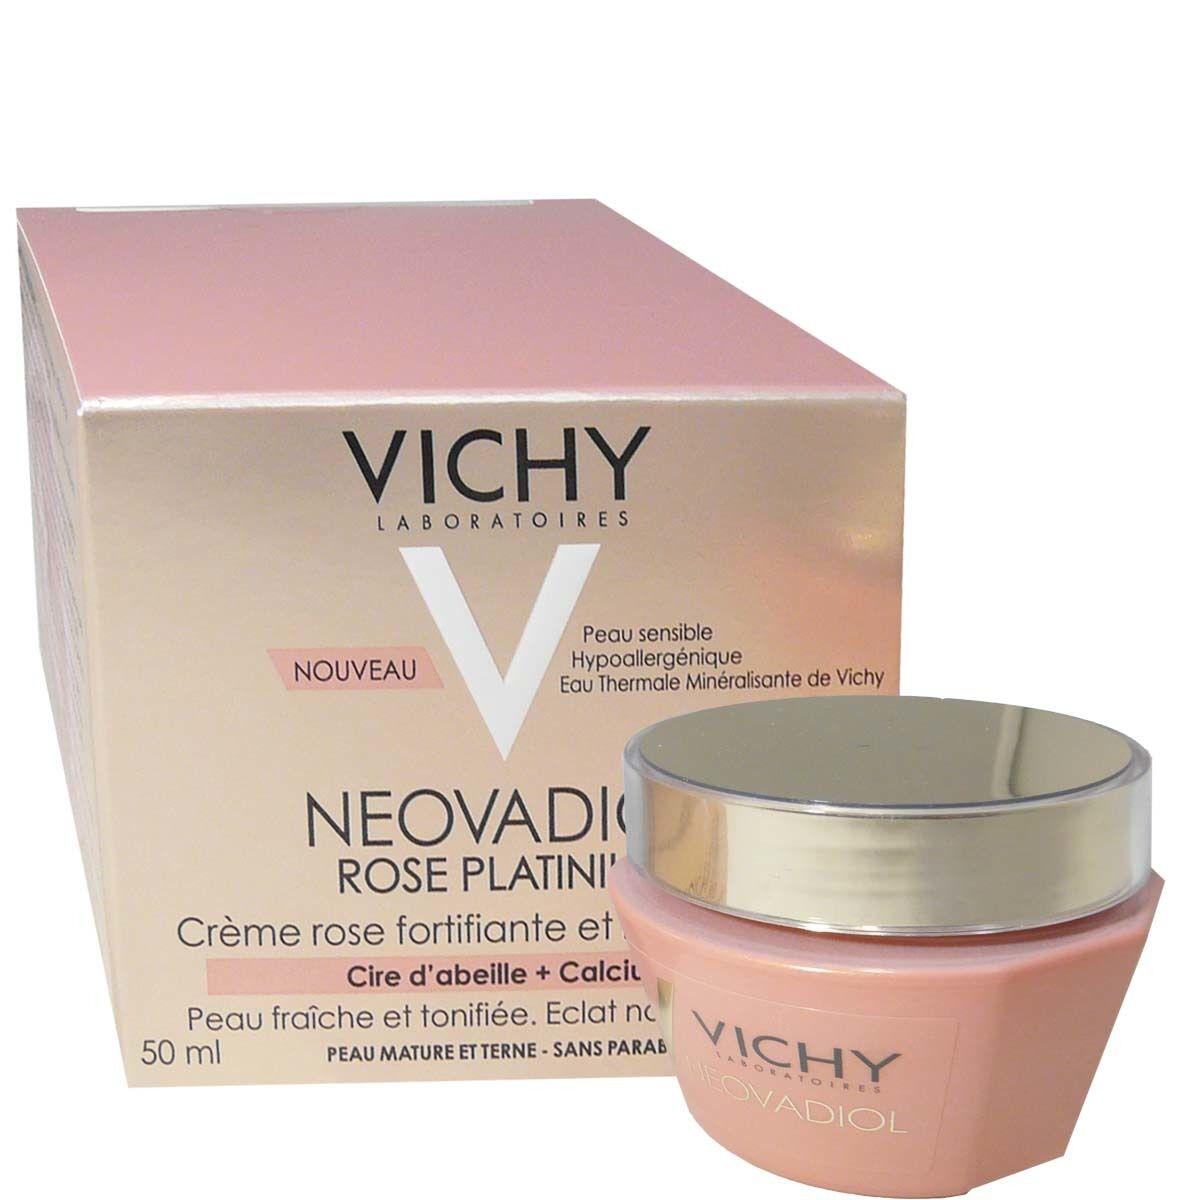 Vichy neovadiol cire d'abeille et calcium 50 ml